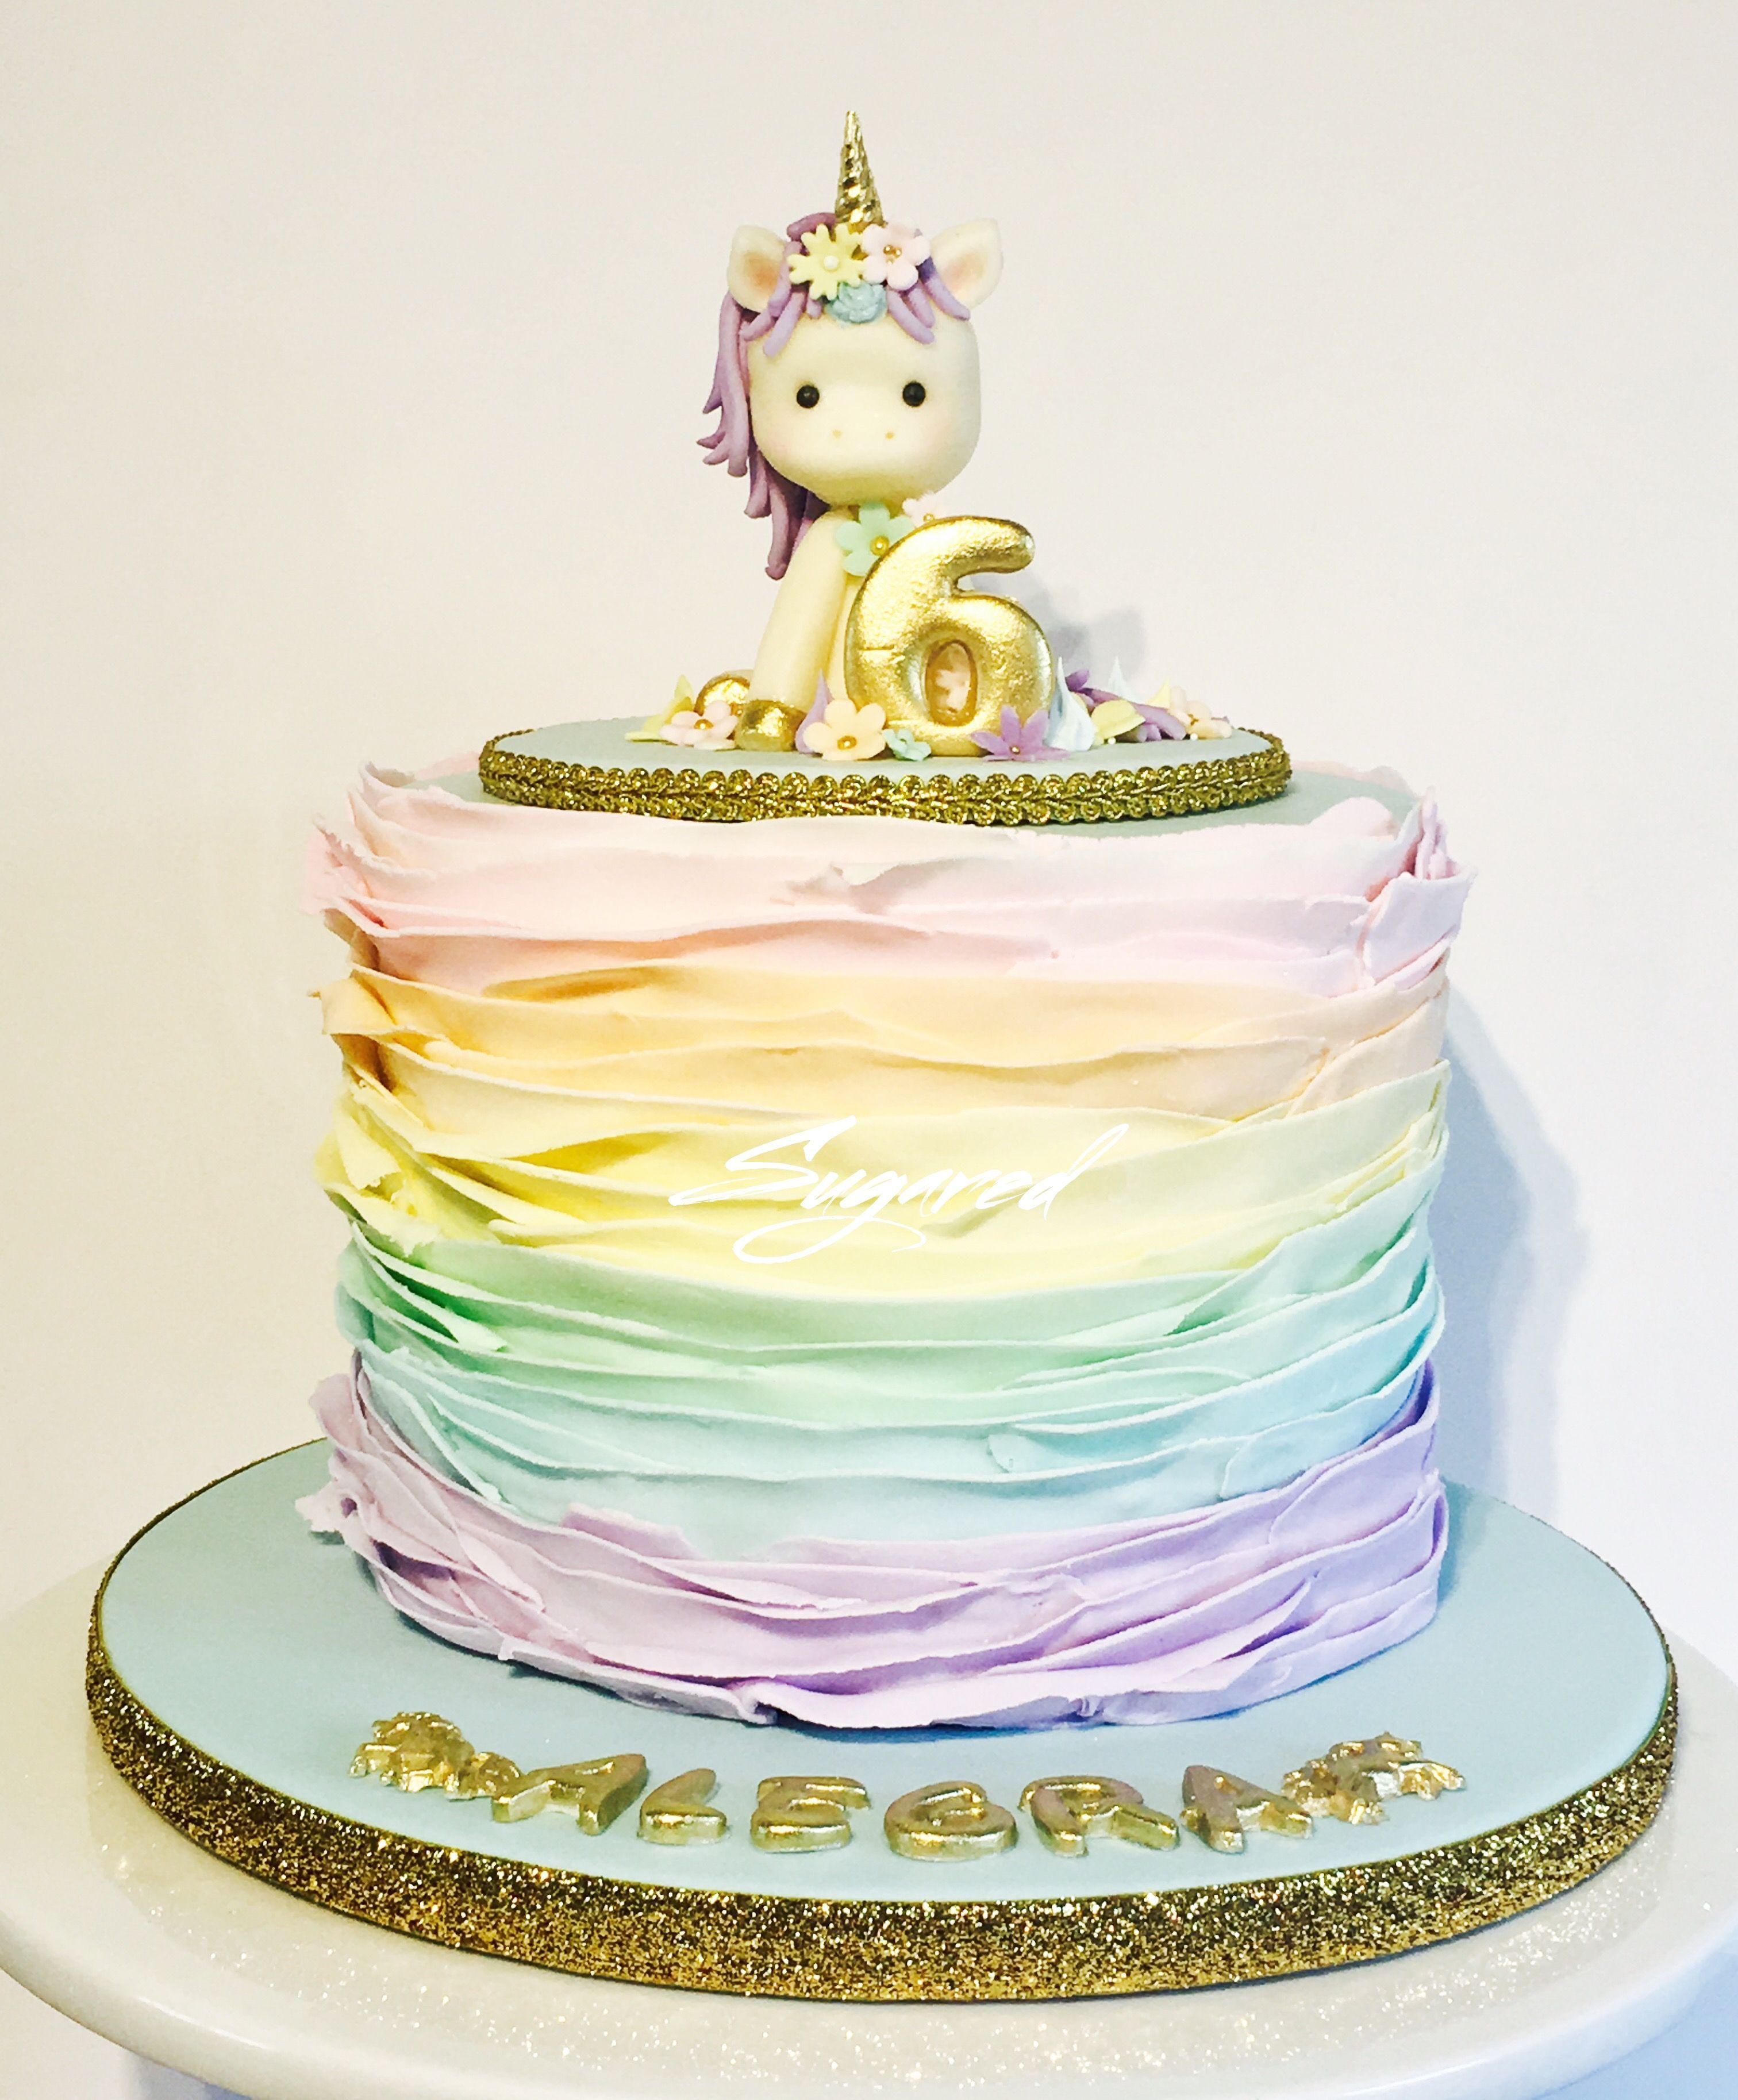 Carousel Cake Unicorn Party Cakes Cookie Favors Custom Cookies